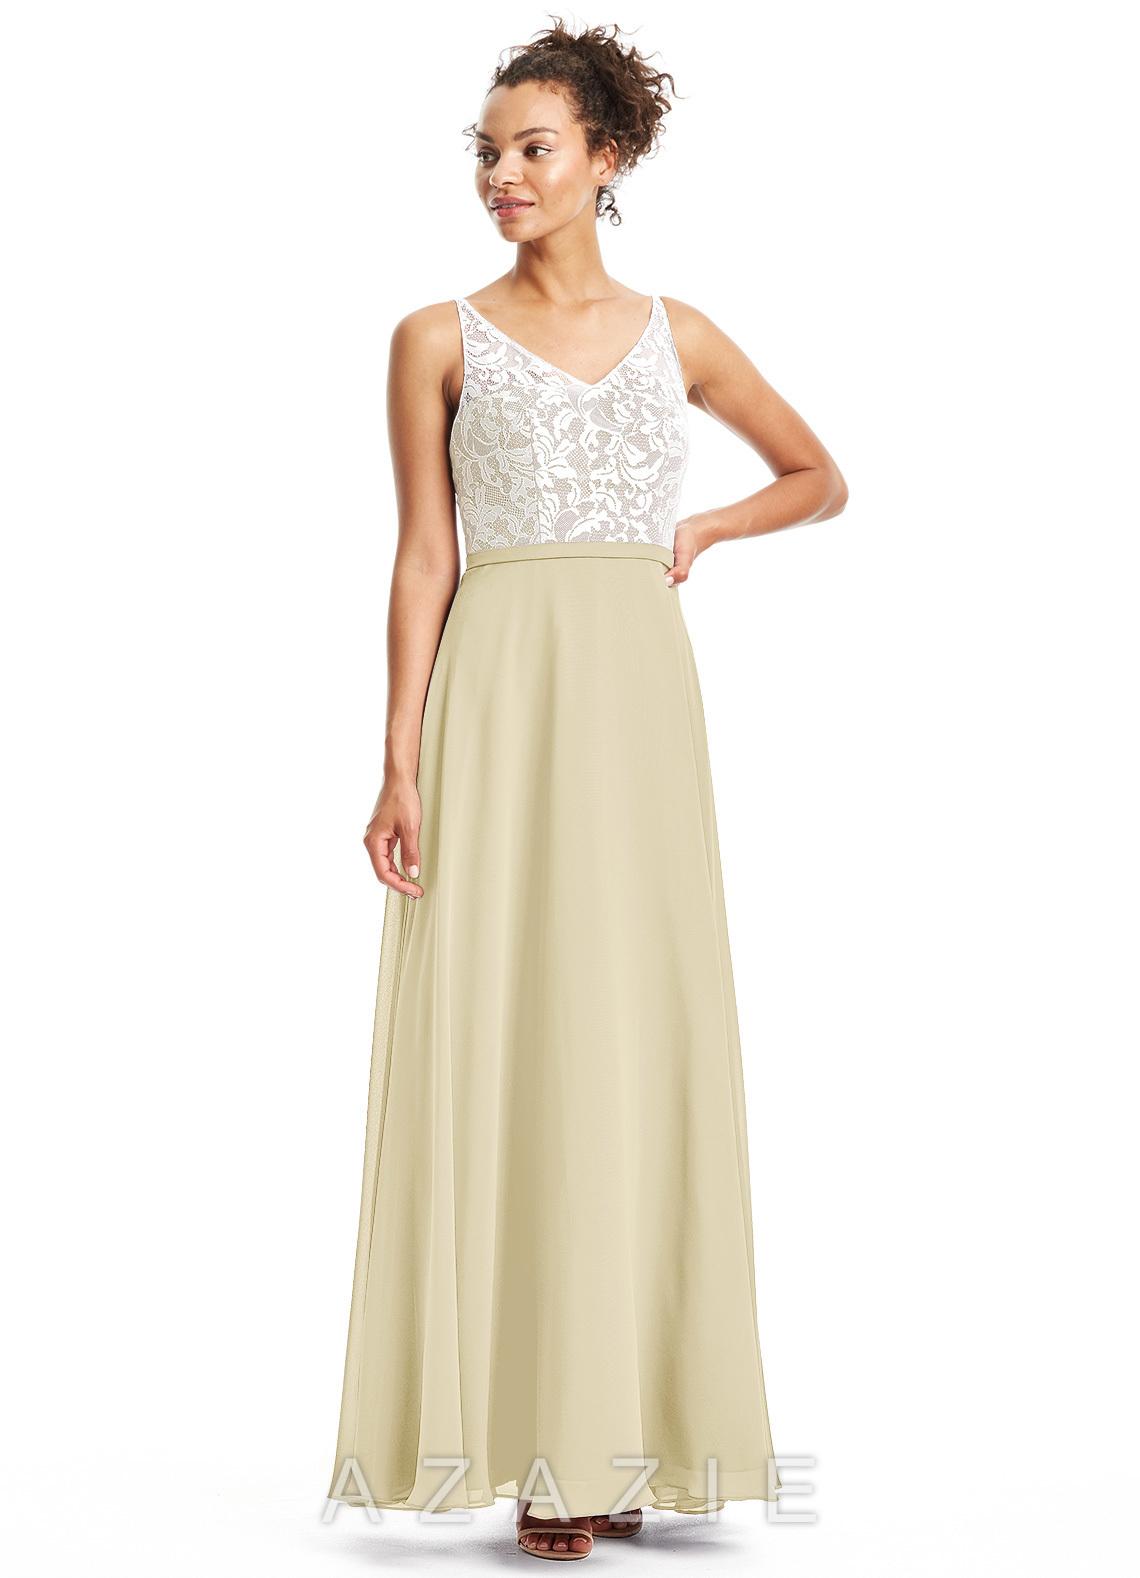 3dfb99d7b2c Azazie Gloria Bridesmaid Dresses